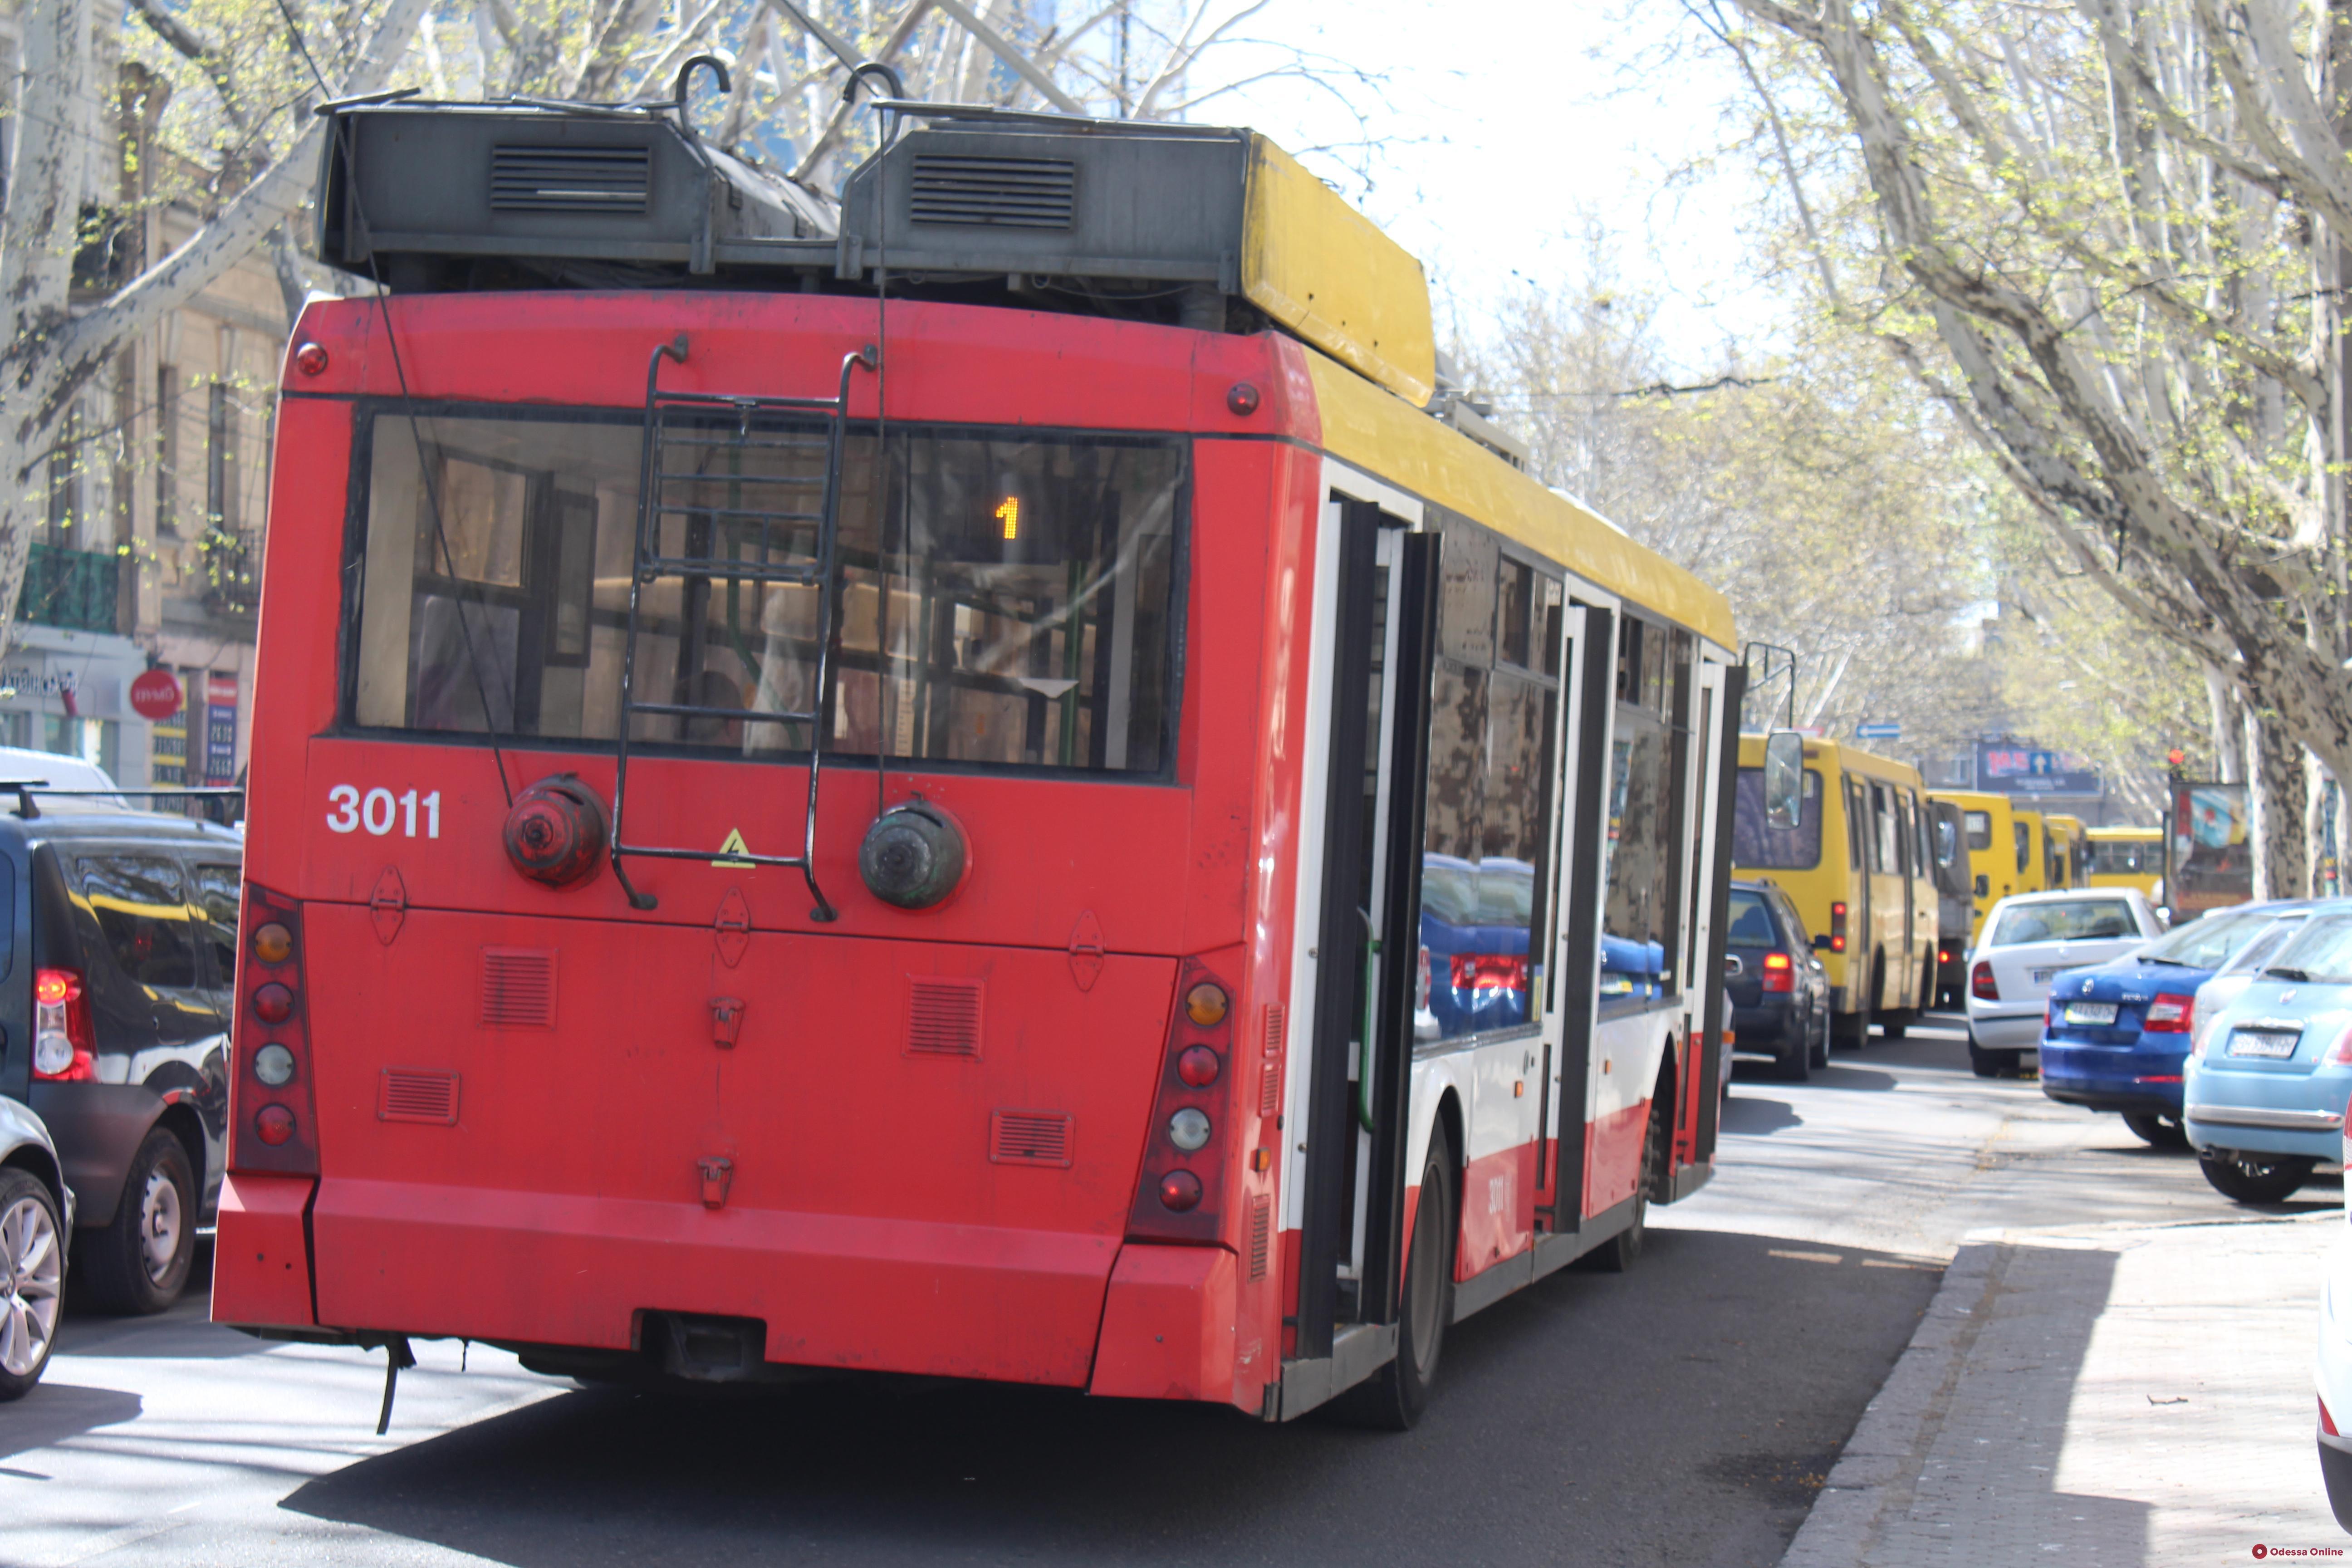 Из-за аварии на электросетях в Одессе остановлено движение трамваев и троллейбусов на семи маршрутах (обновлено)